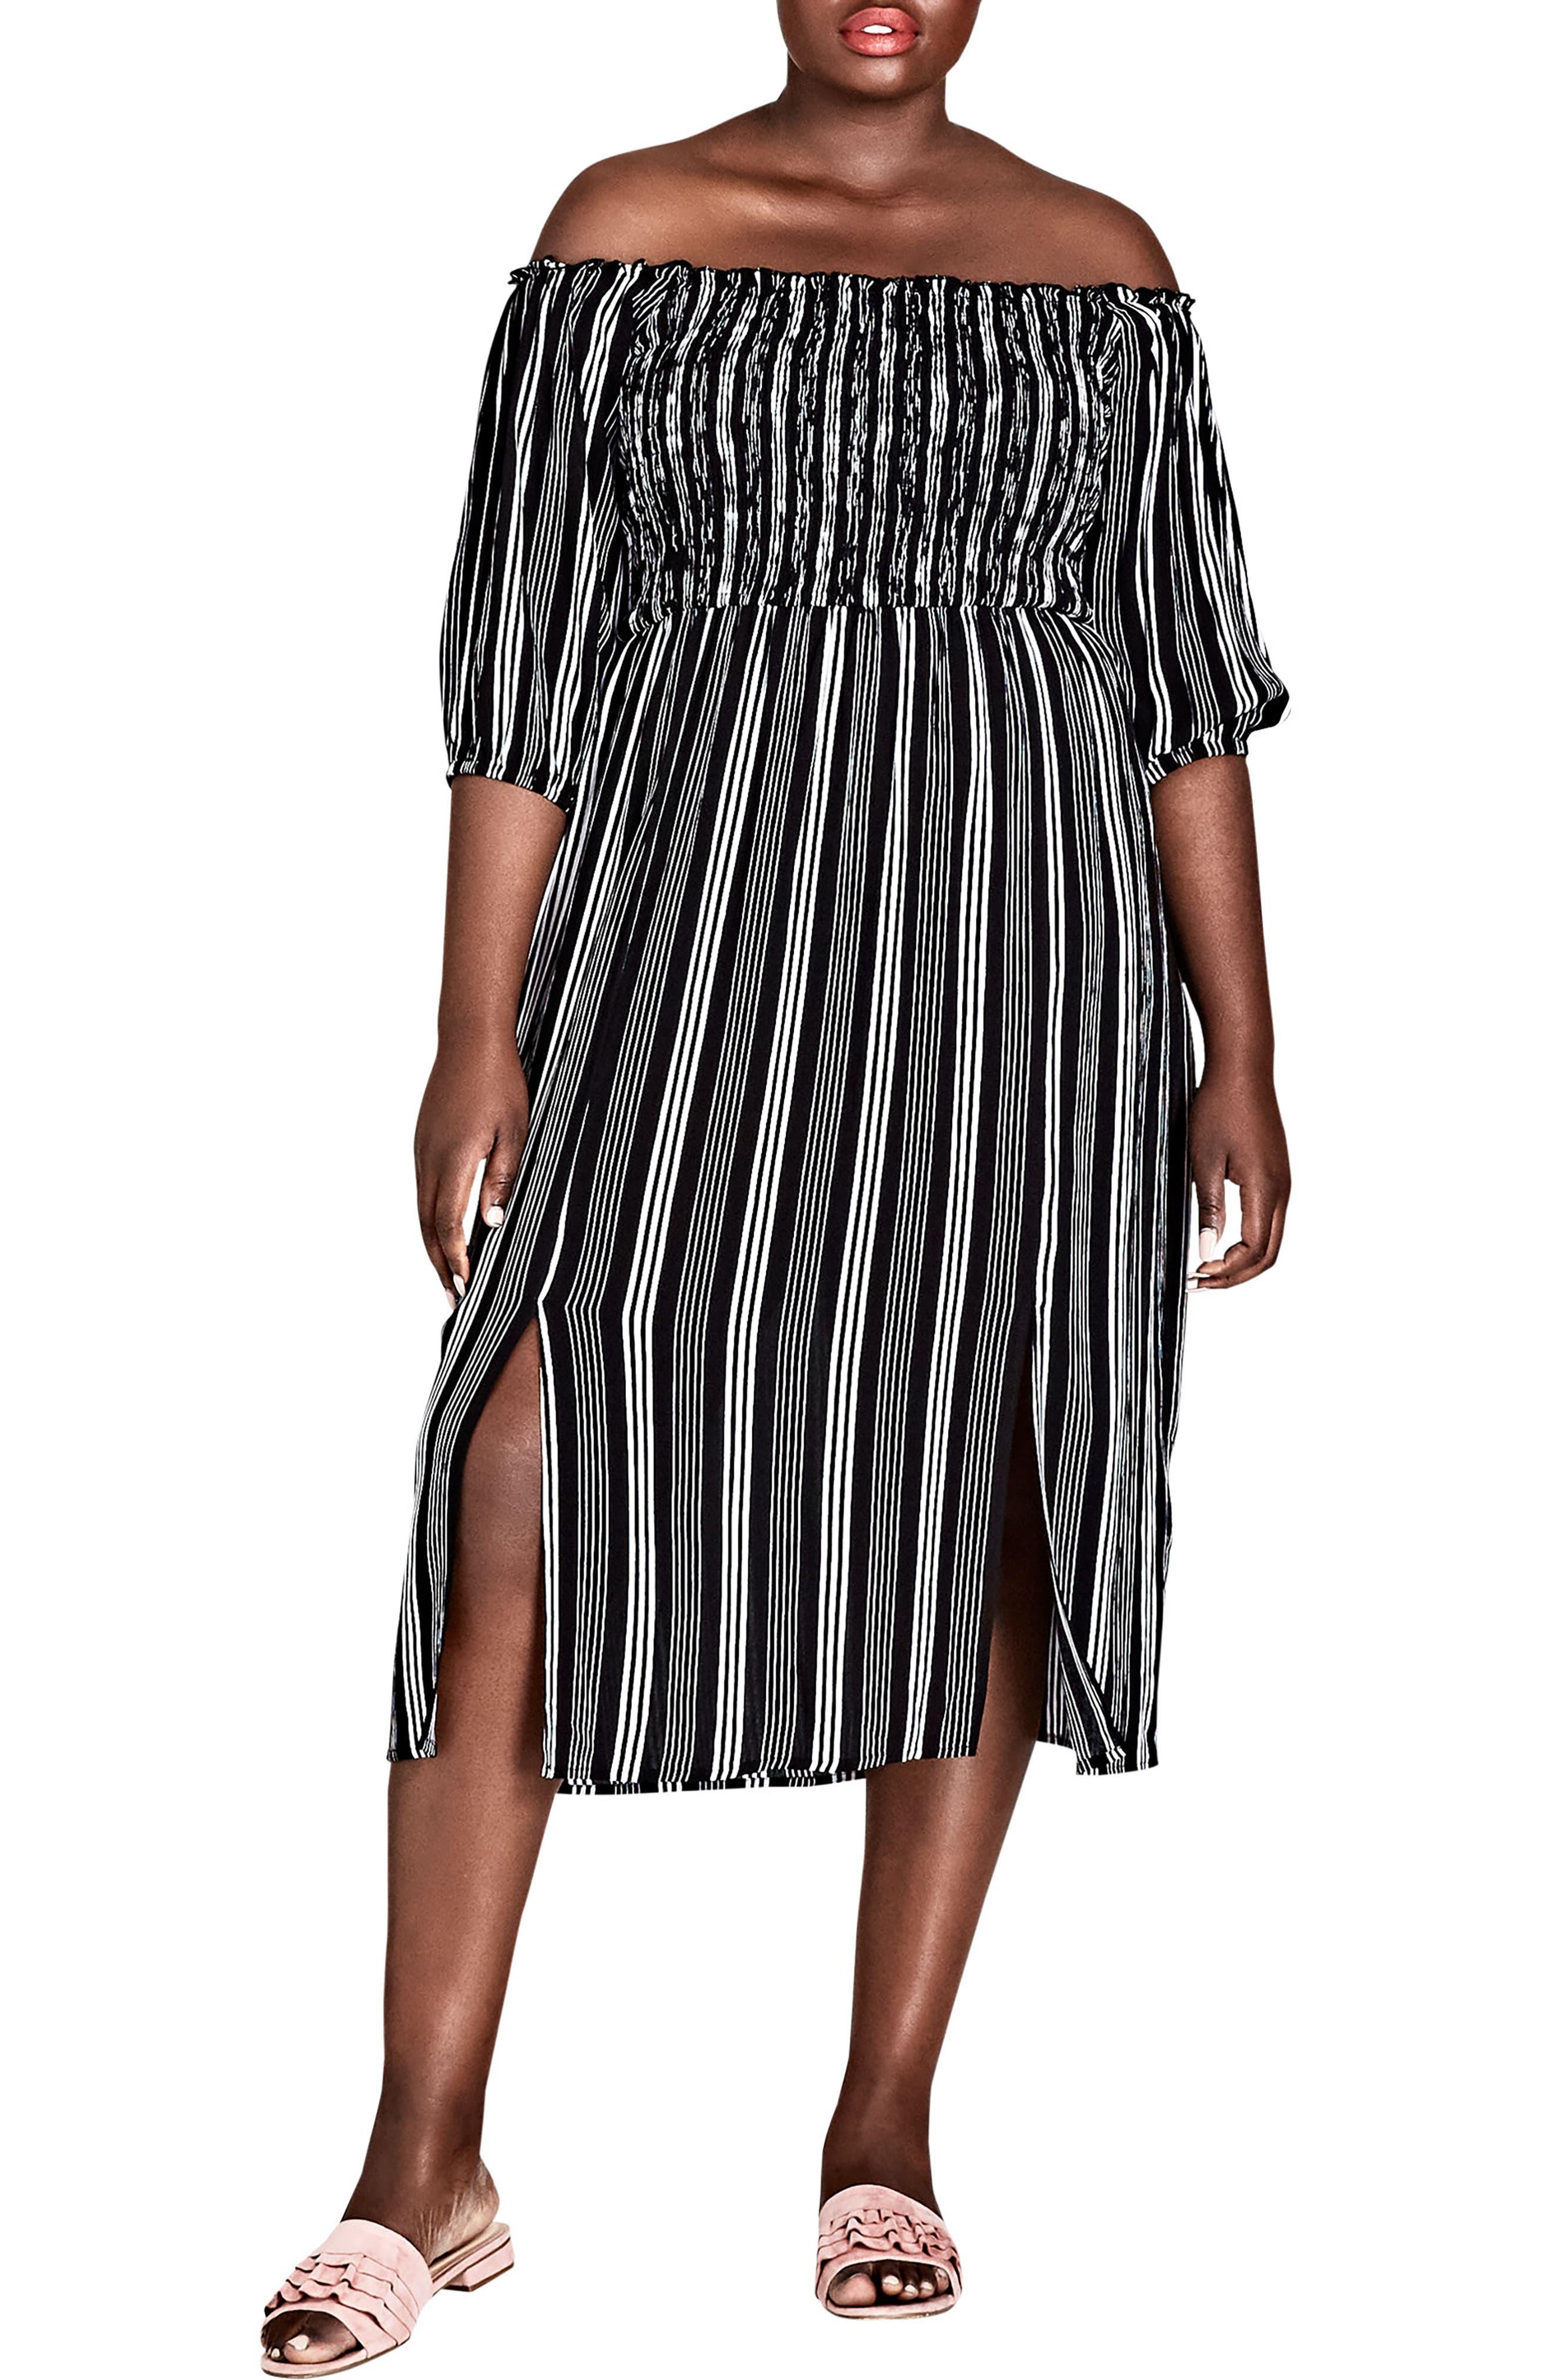 Stripe Play Off the Shoulder Midi Dress,                             Main thumbnail 1, color,                             STRIPE PLAY